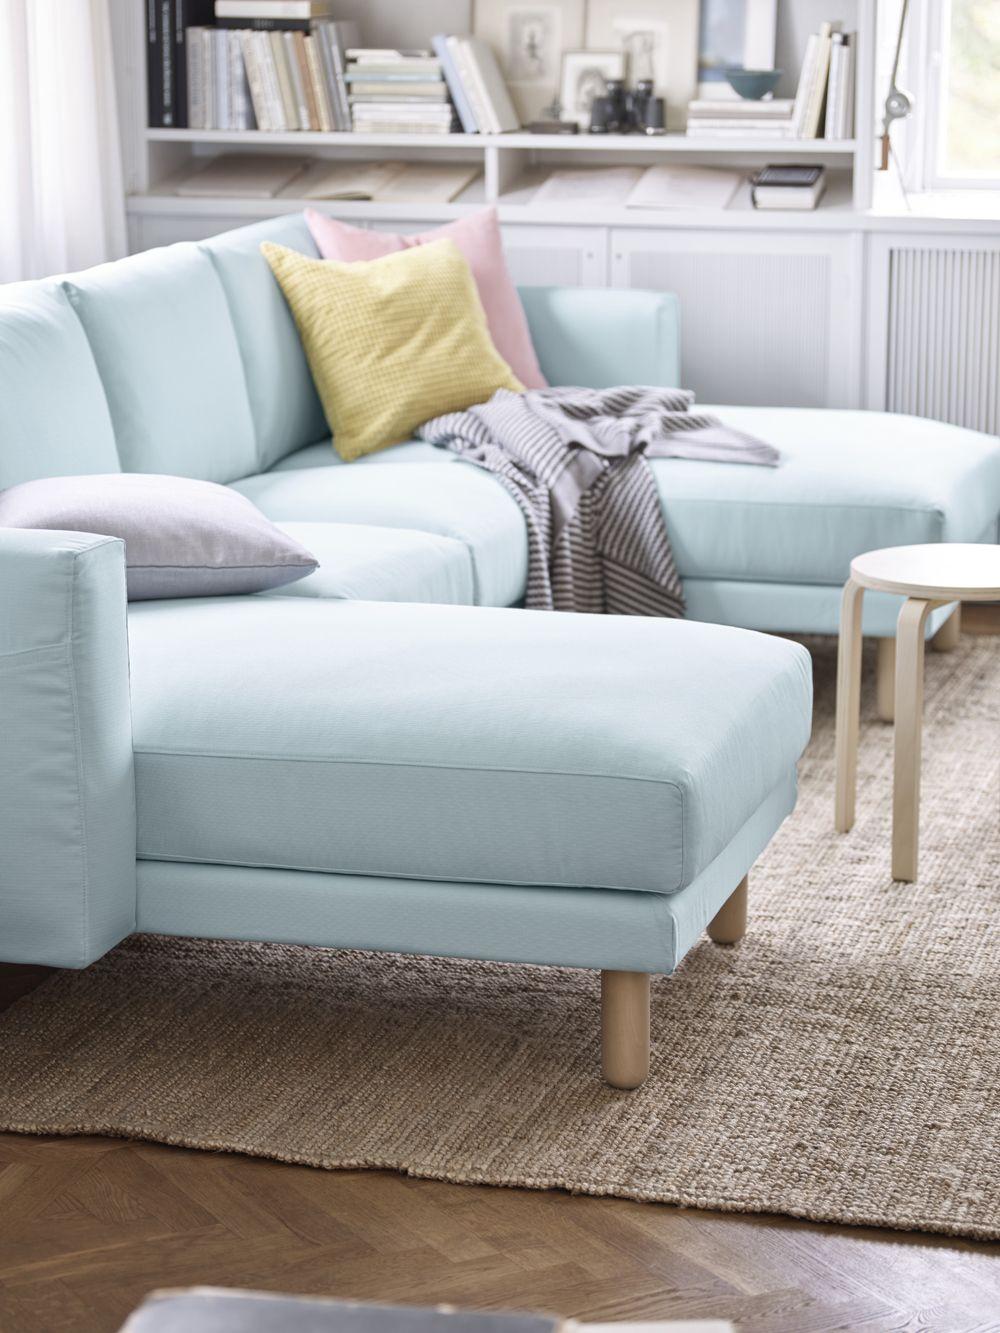 canap ikea norsborg decor. Black Bedroom Furniture Sets. Home Design Ideas